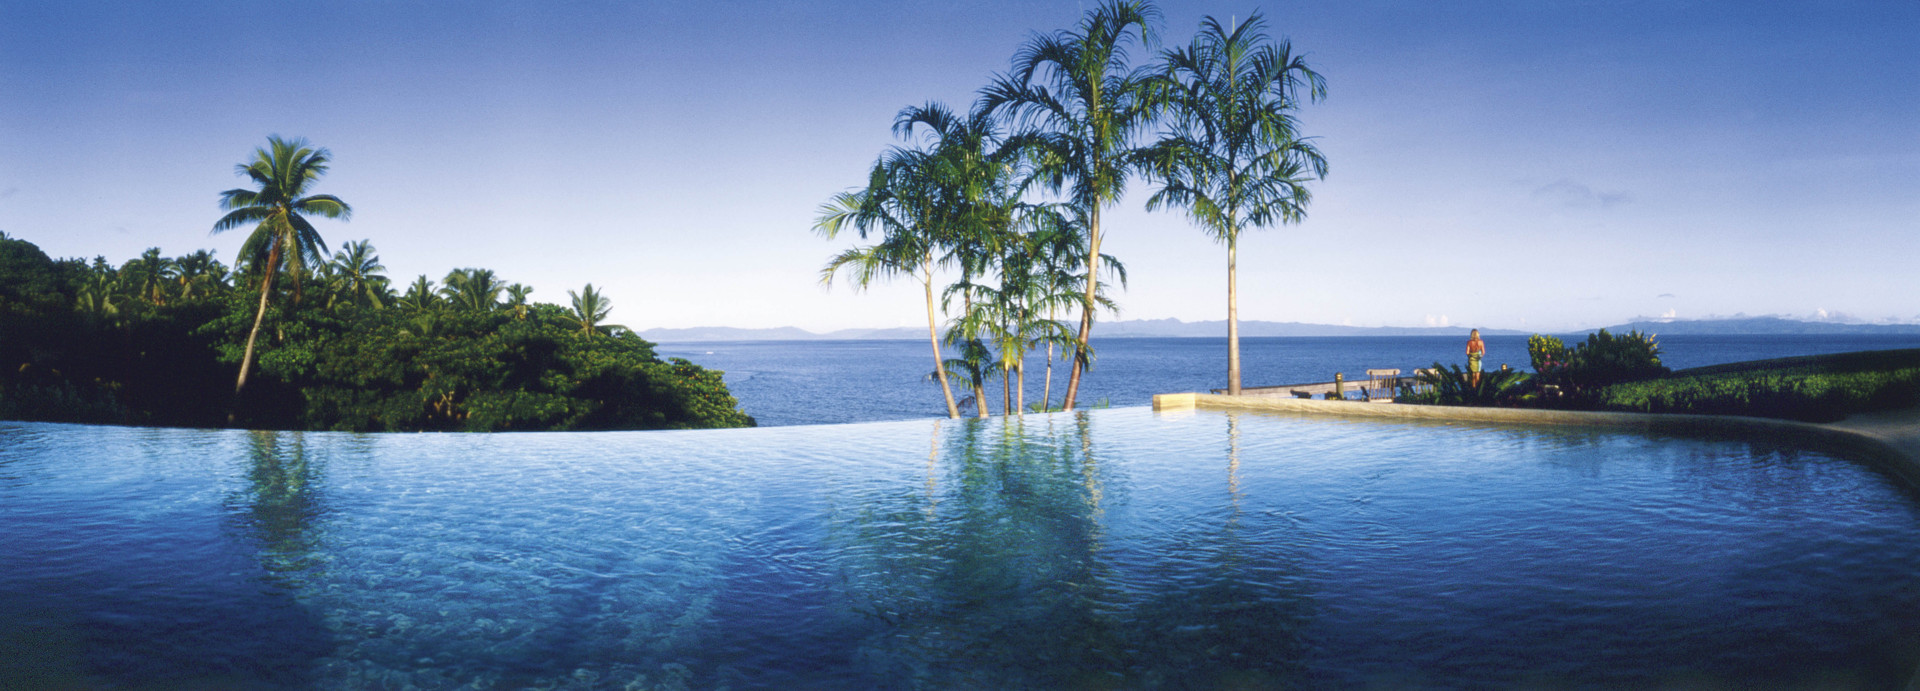 Taveuni Island Resort And Spa Fiji South Pacific